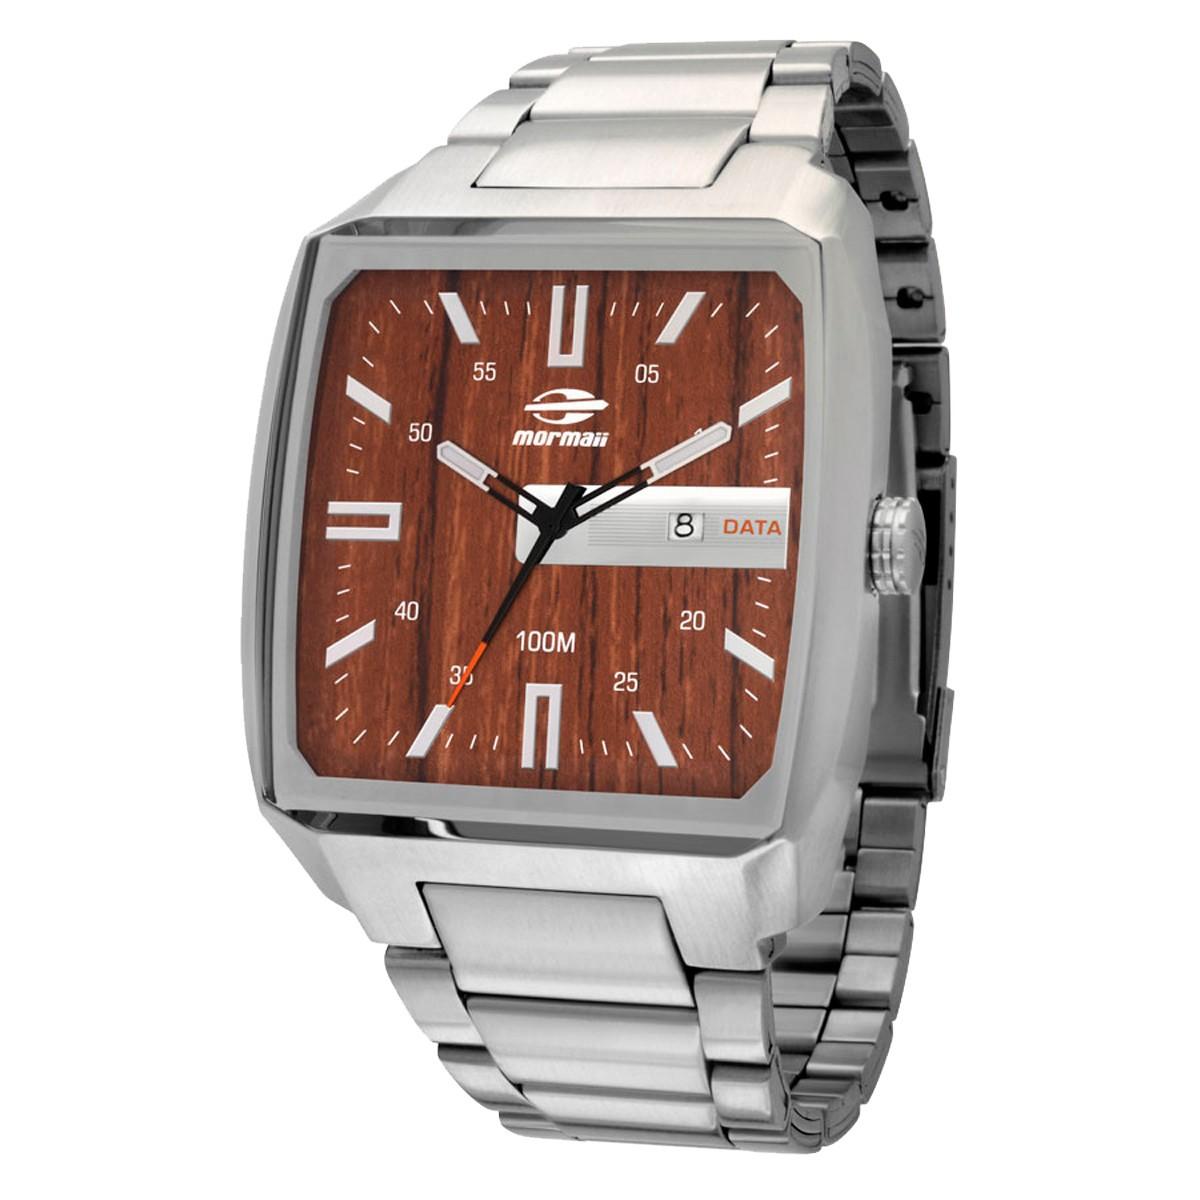 Relógio Mormaii Masculino - 2315ZD/1M  - Dumont Online - Joias e Relógios